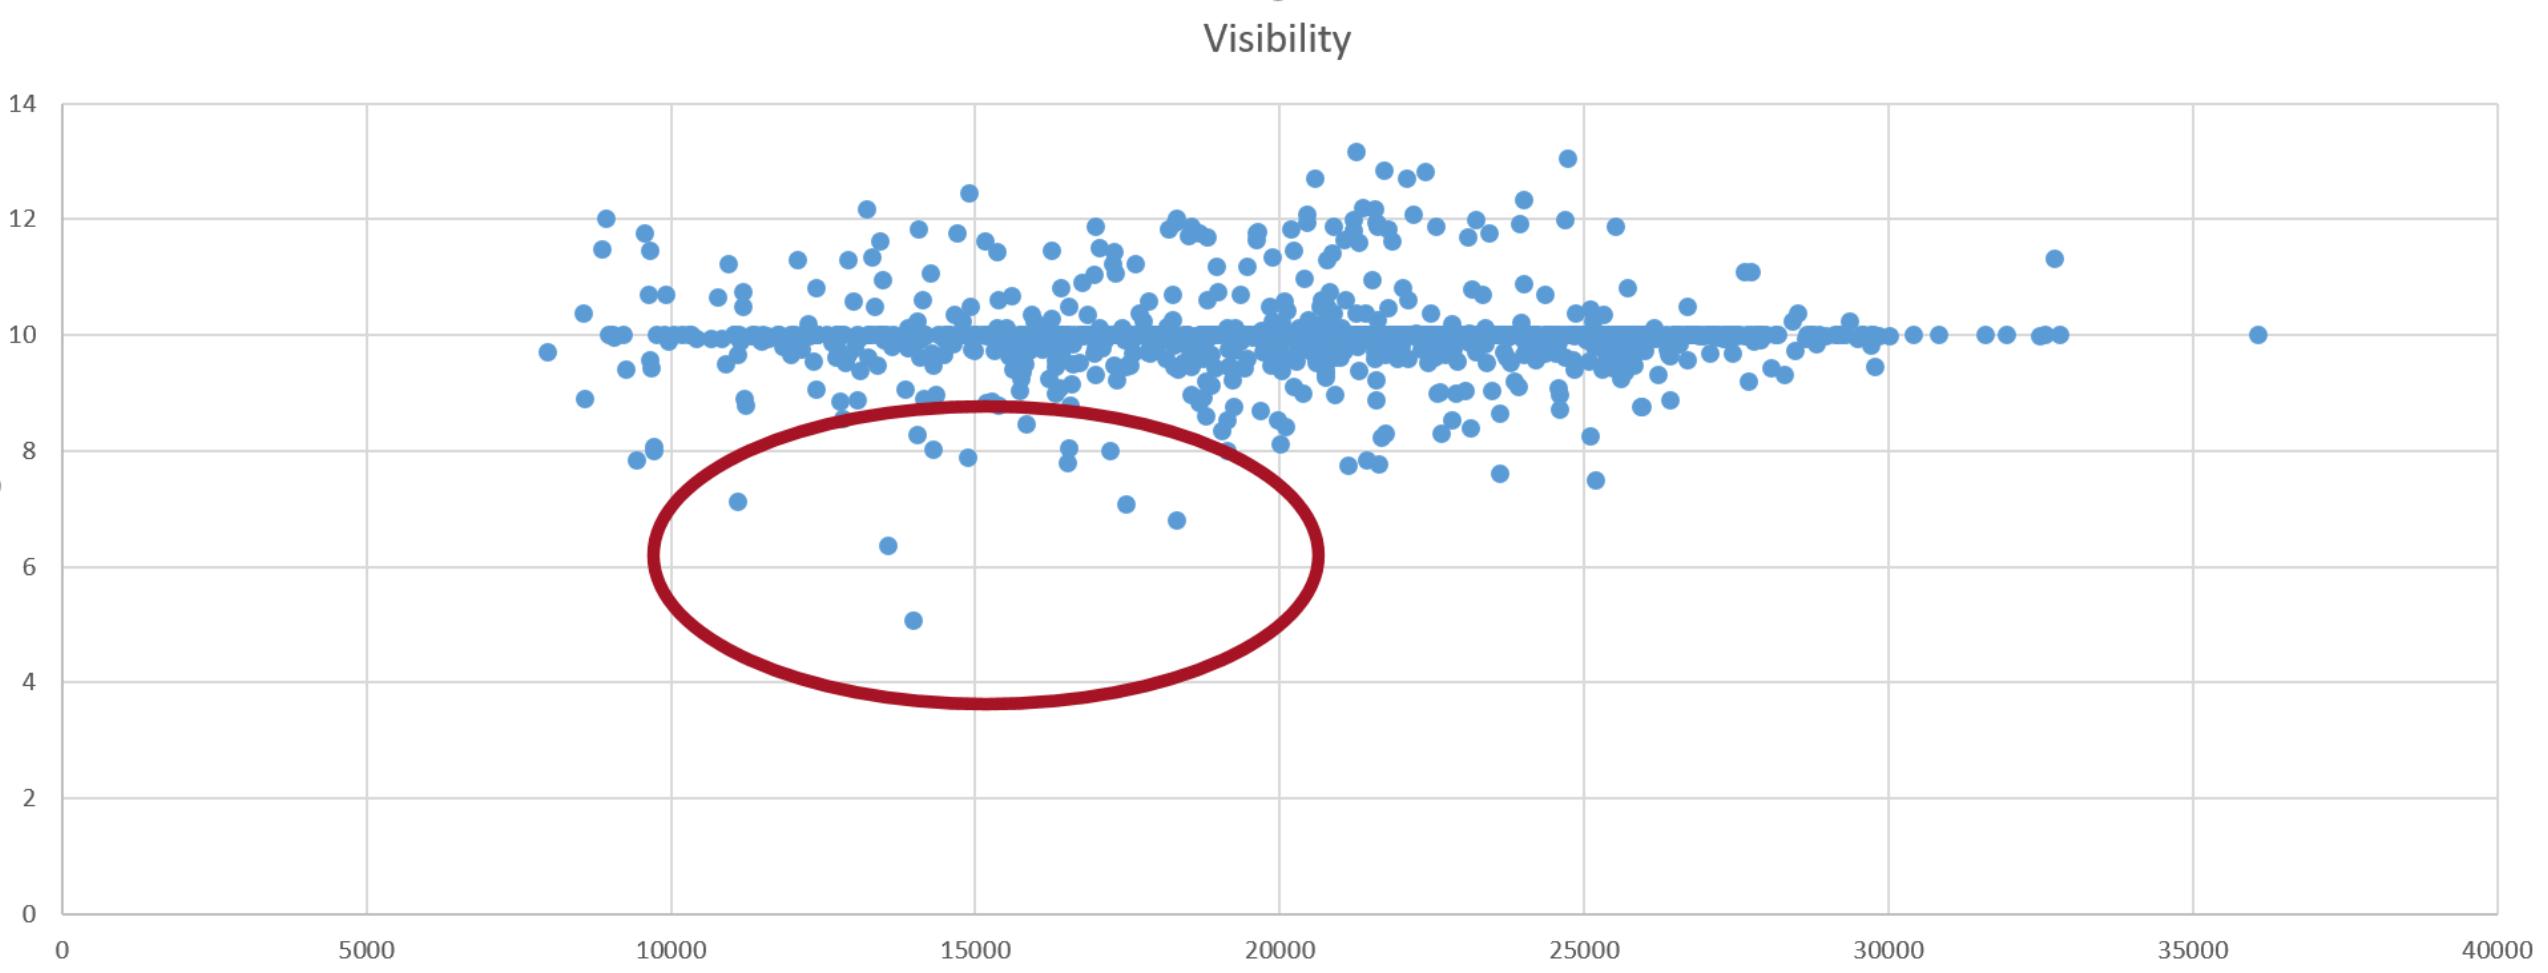 Visitors vs. Visibility